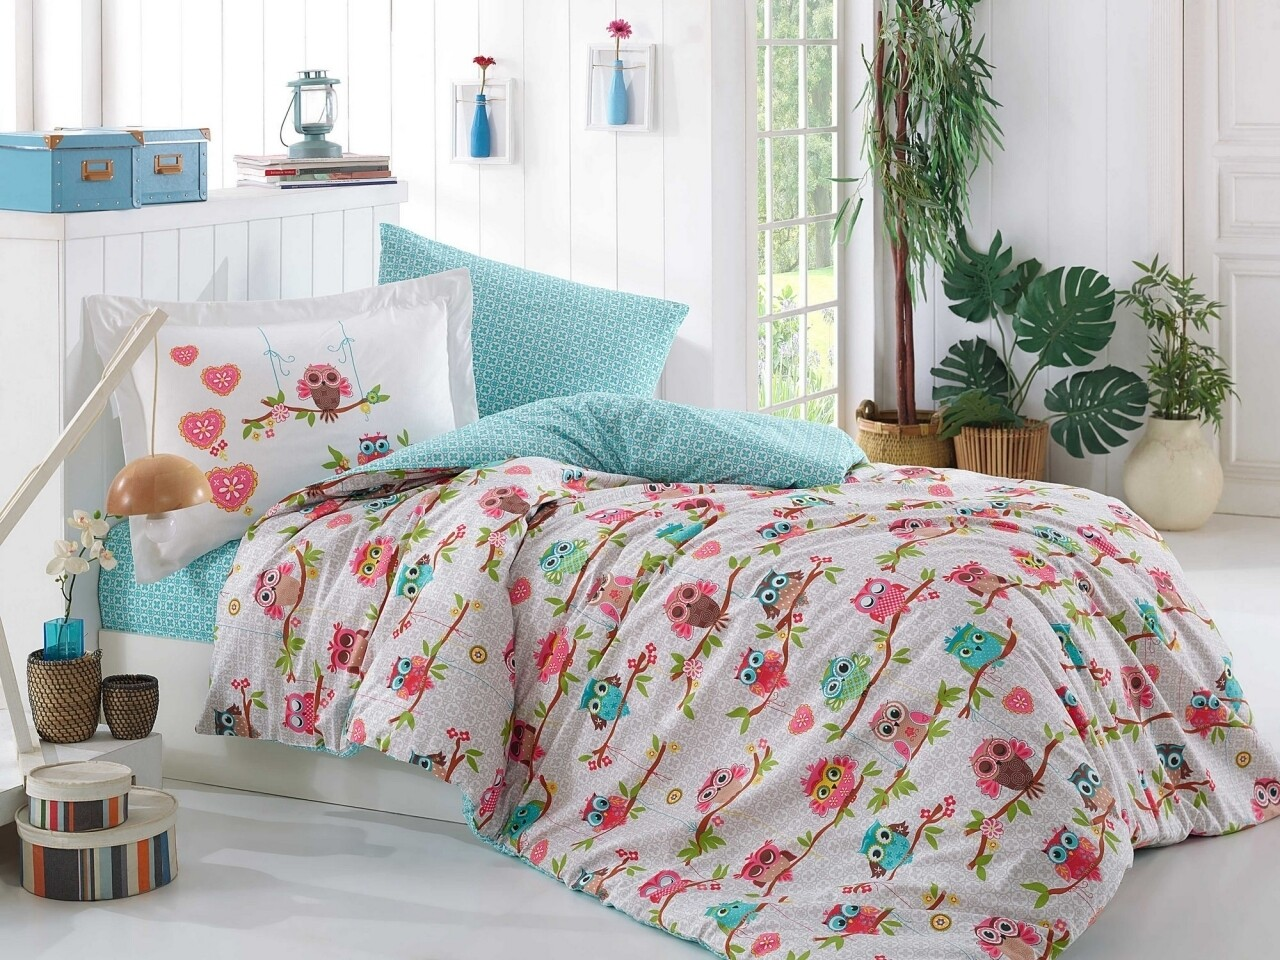 Lenjerie de pat pentru o persoana, 3 piese, 100% bumbac poplin, Hobby, Candy Pink, multicolora